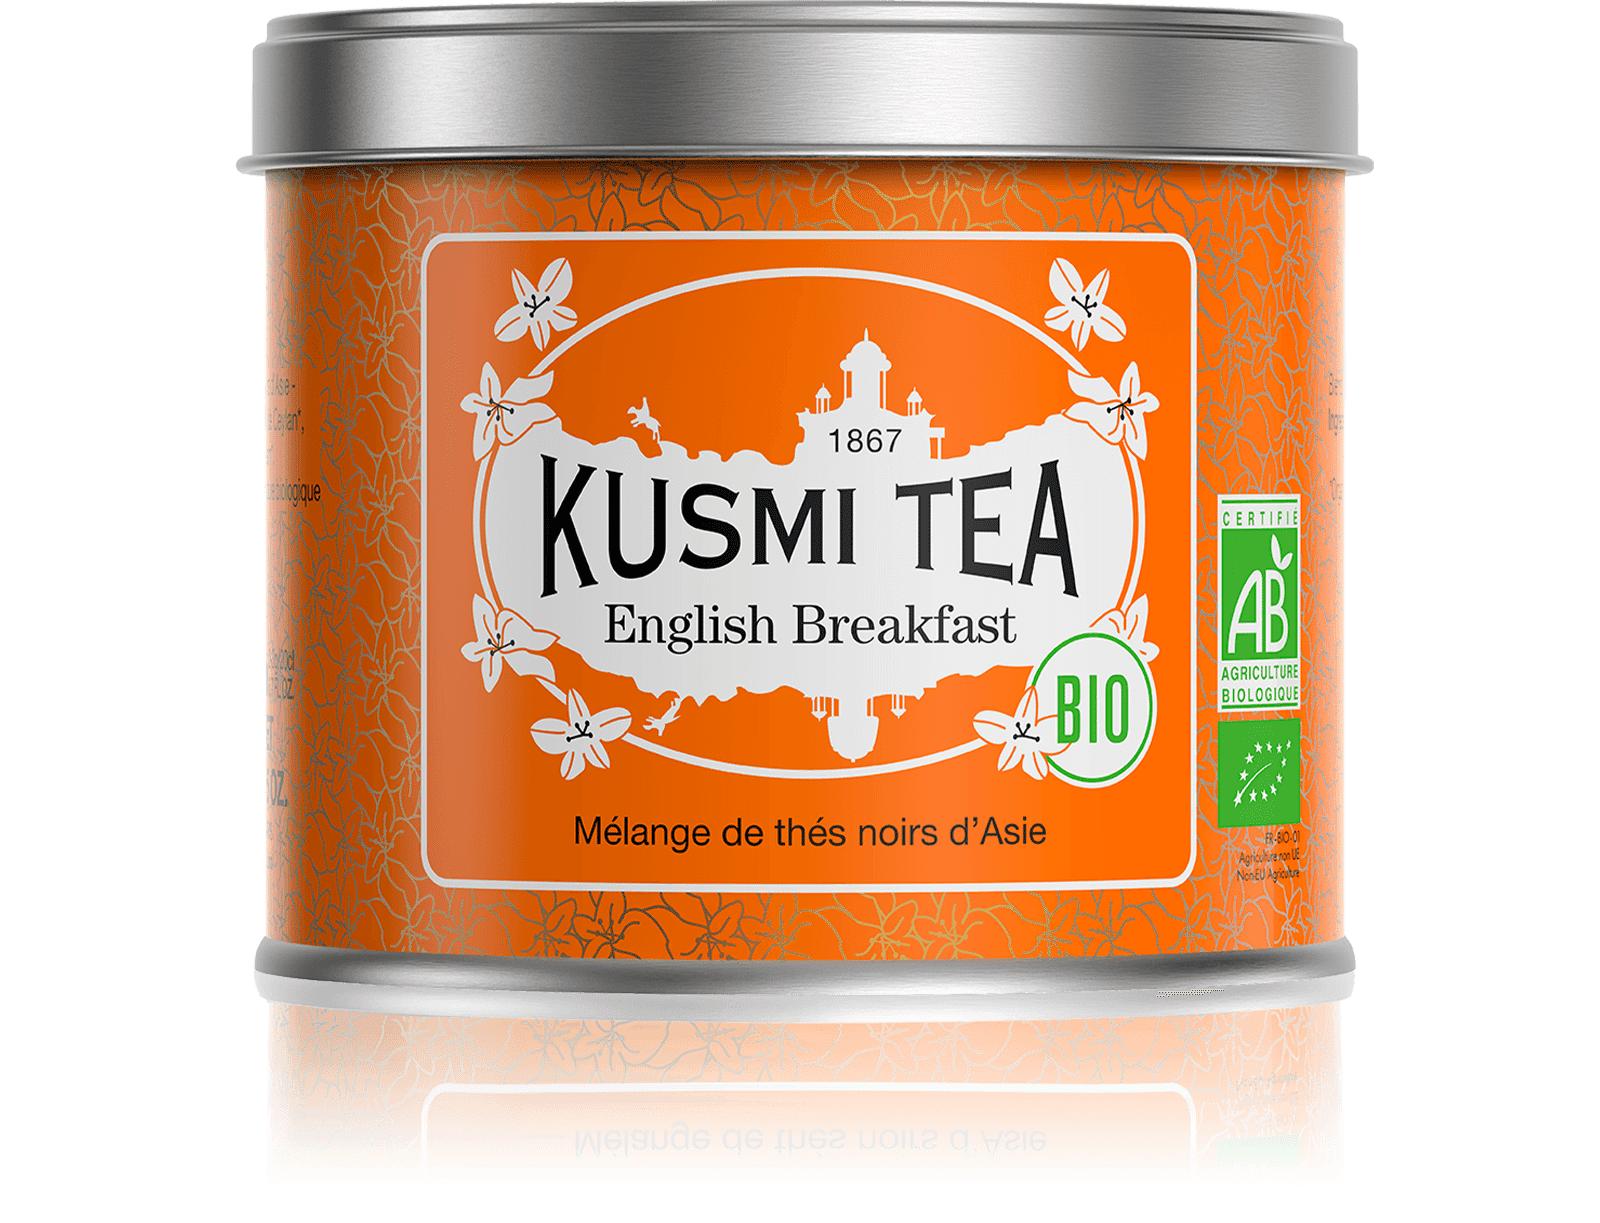 KUSMI TEA English Breakfast bio - Thé noir de Ceylan, Assam - Boîte de thé en vrac - Kusmi Tea